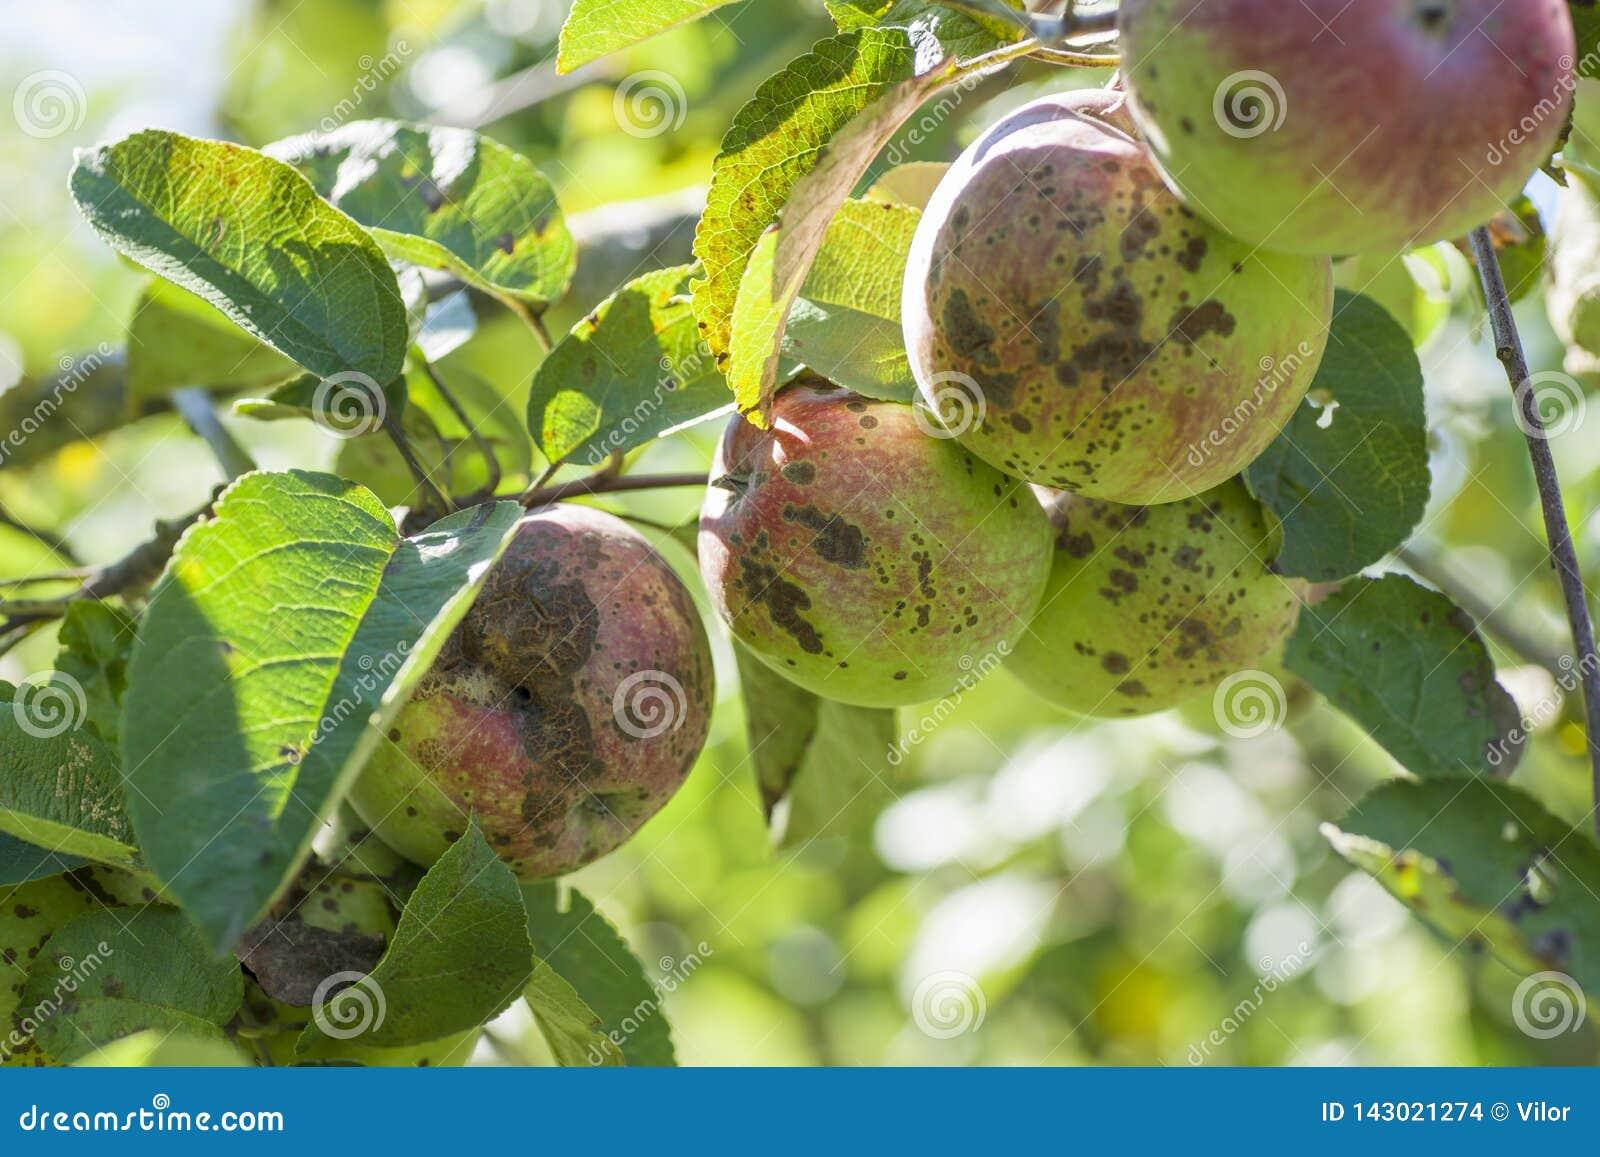 Apple scab disease stock photo  Image of fruit, autumn